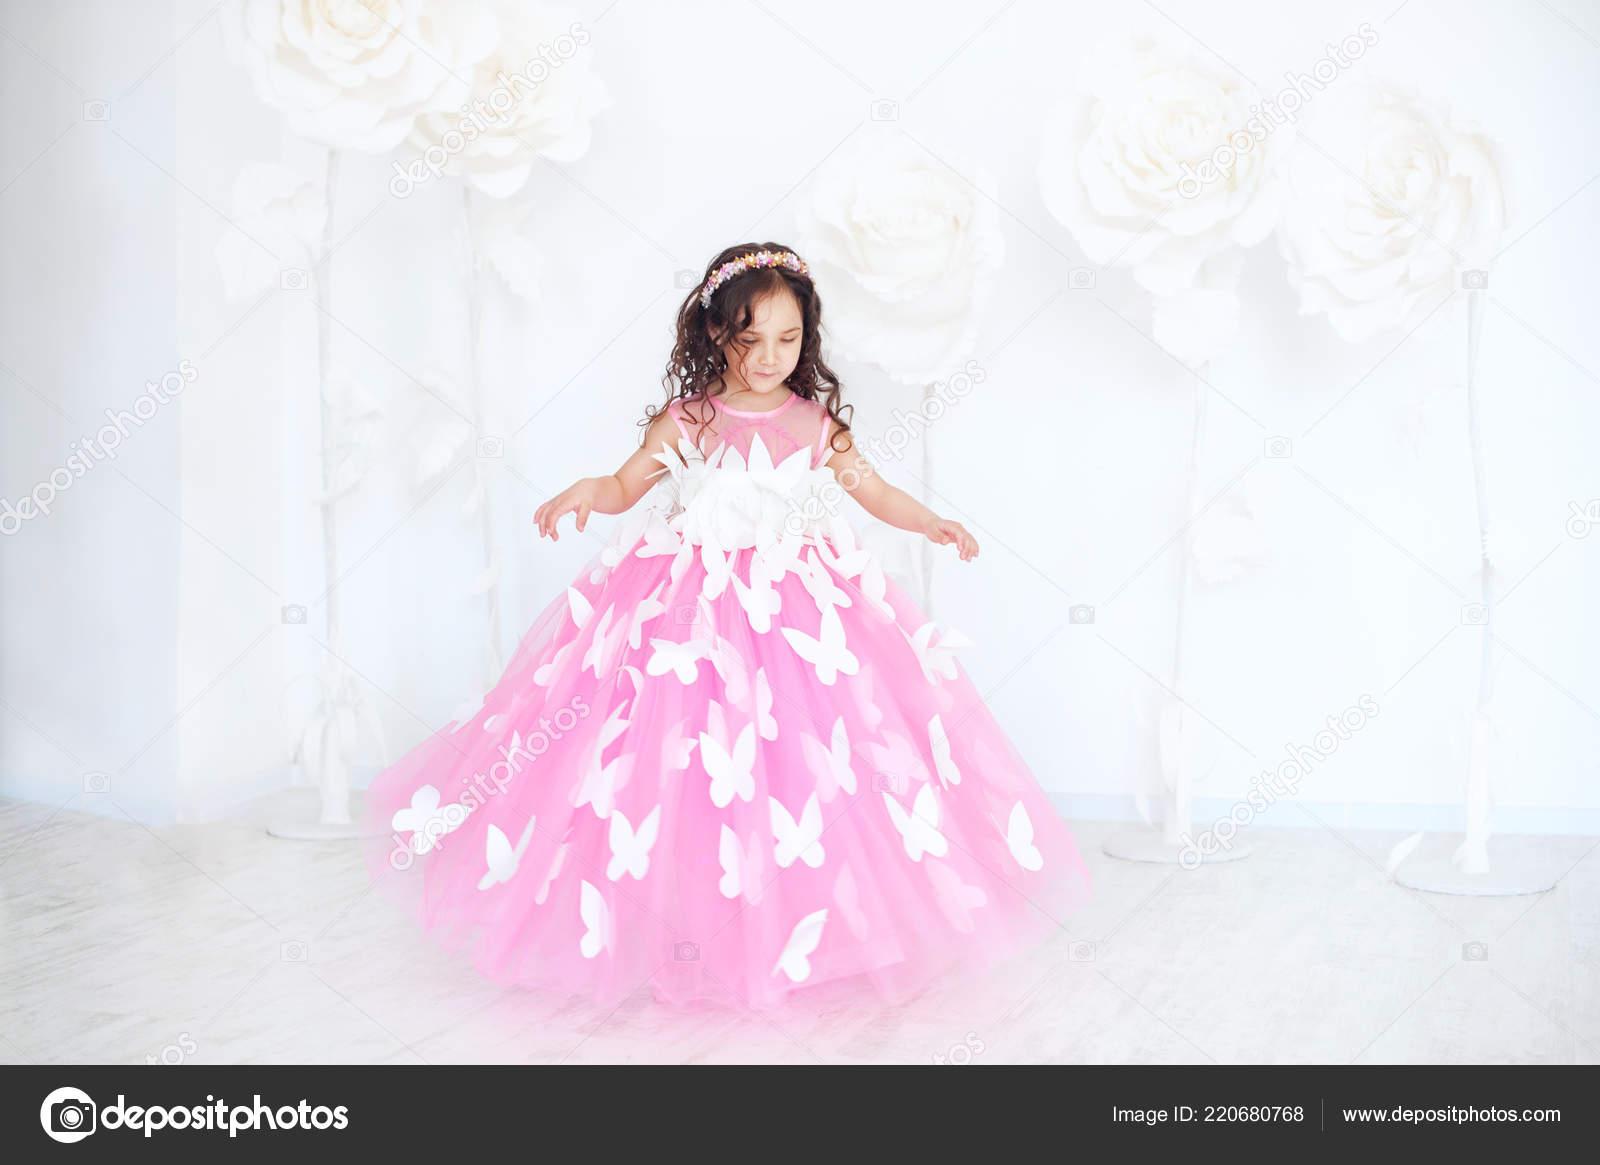 Retrato Niña Sonriente Vestido Princesa Rosa Con Mariposas